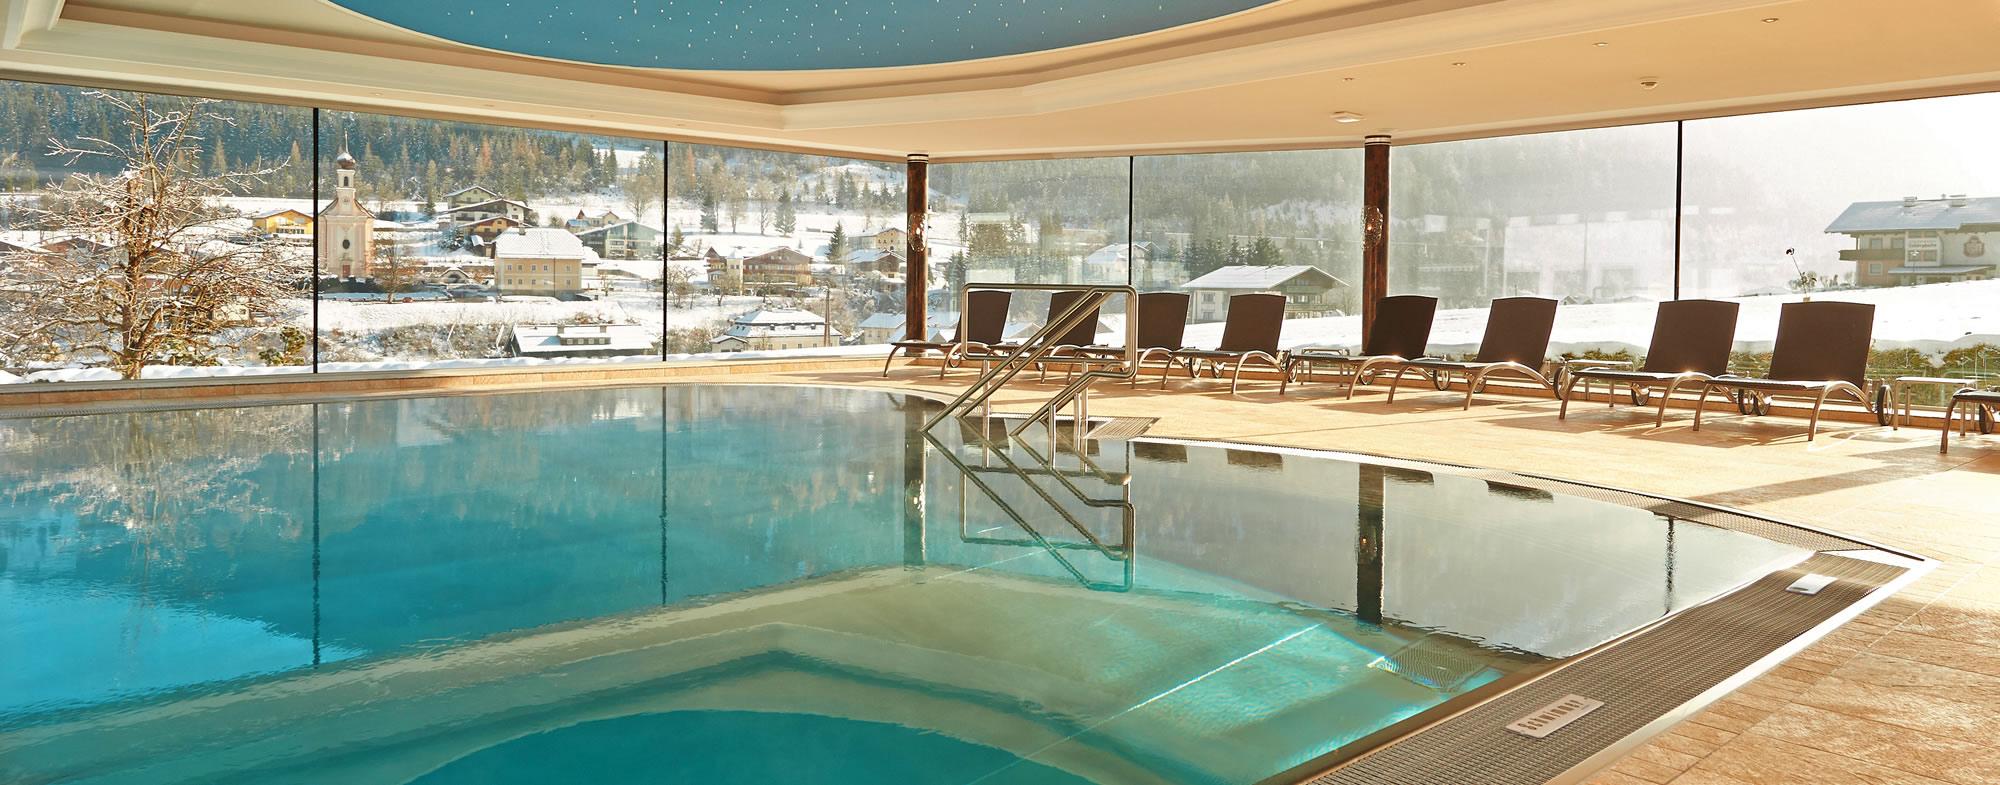 Flachau Hotels  Sterne